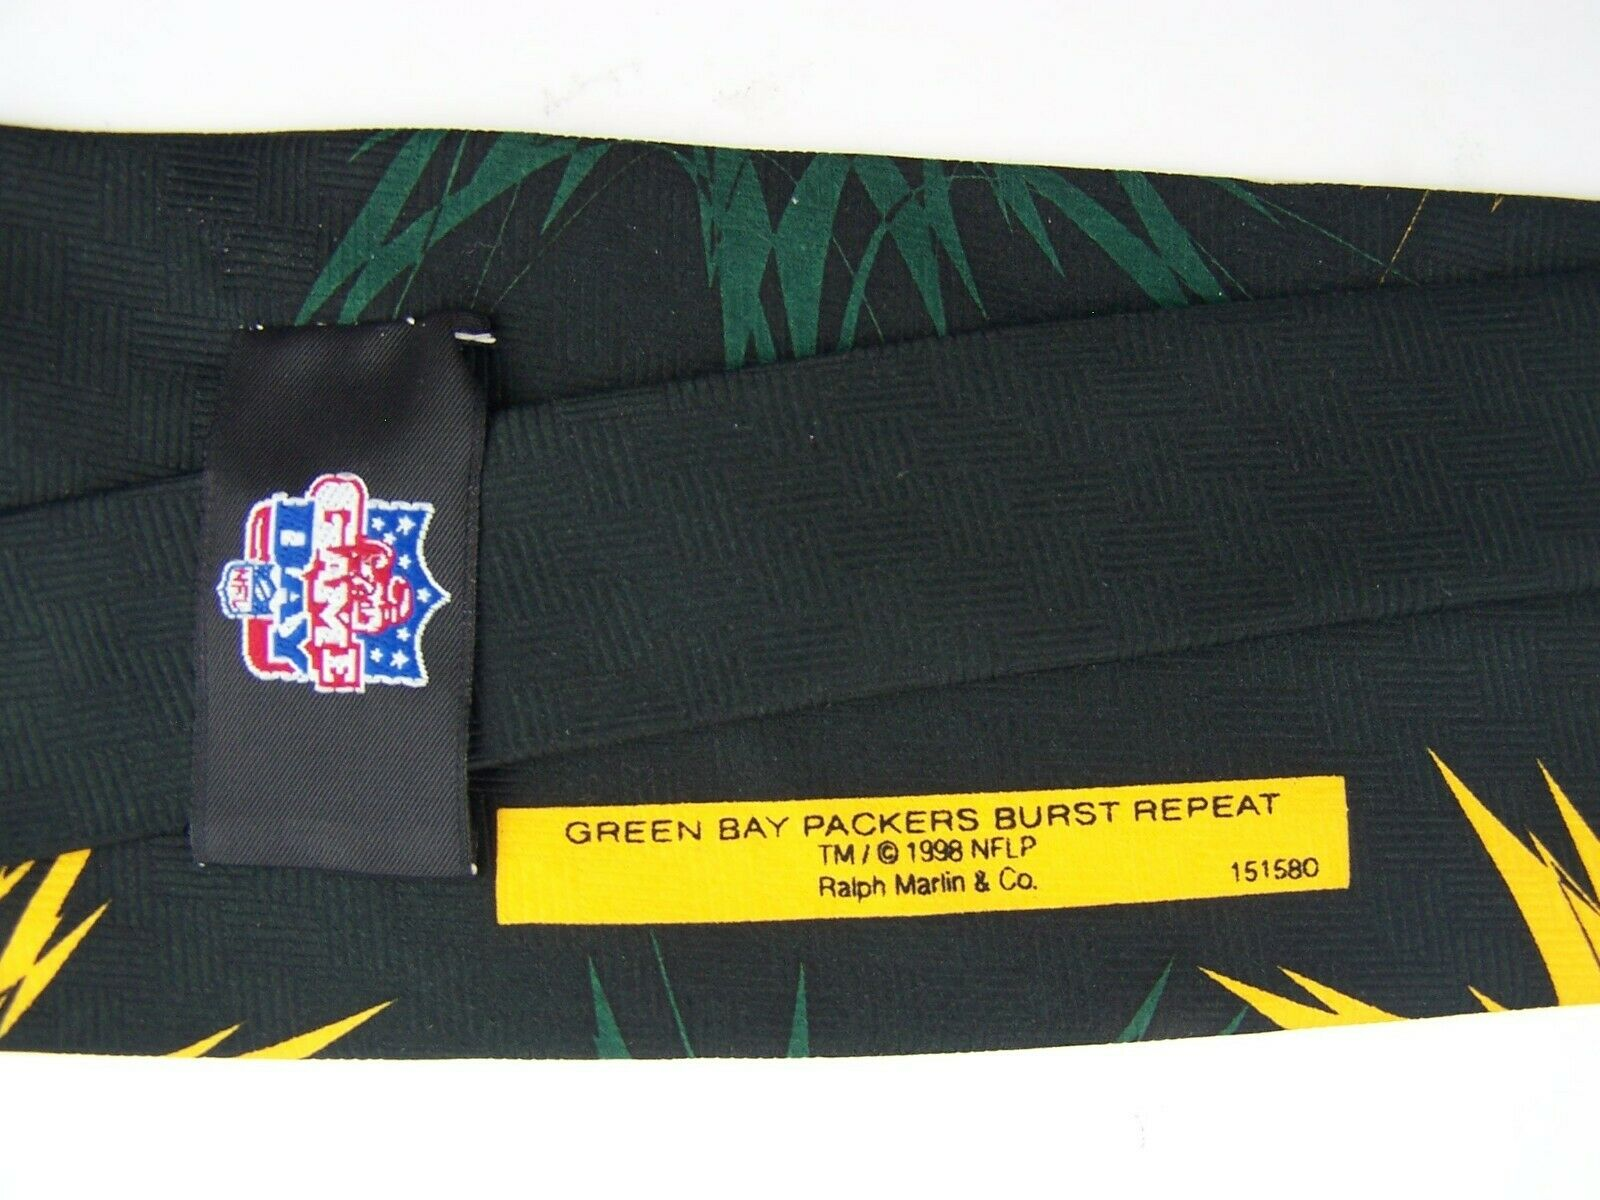 Green Bay Packers Neck Tie Burst Repeat 1998 Ralph Marl